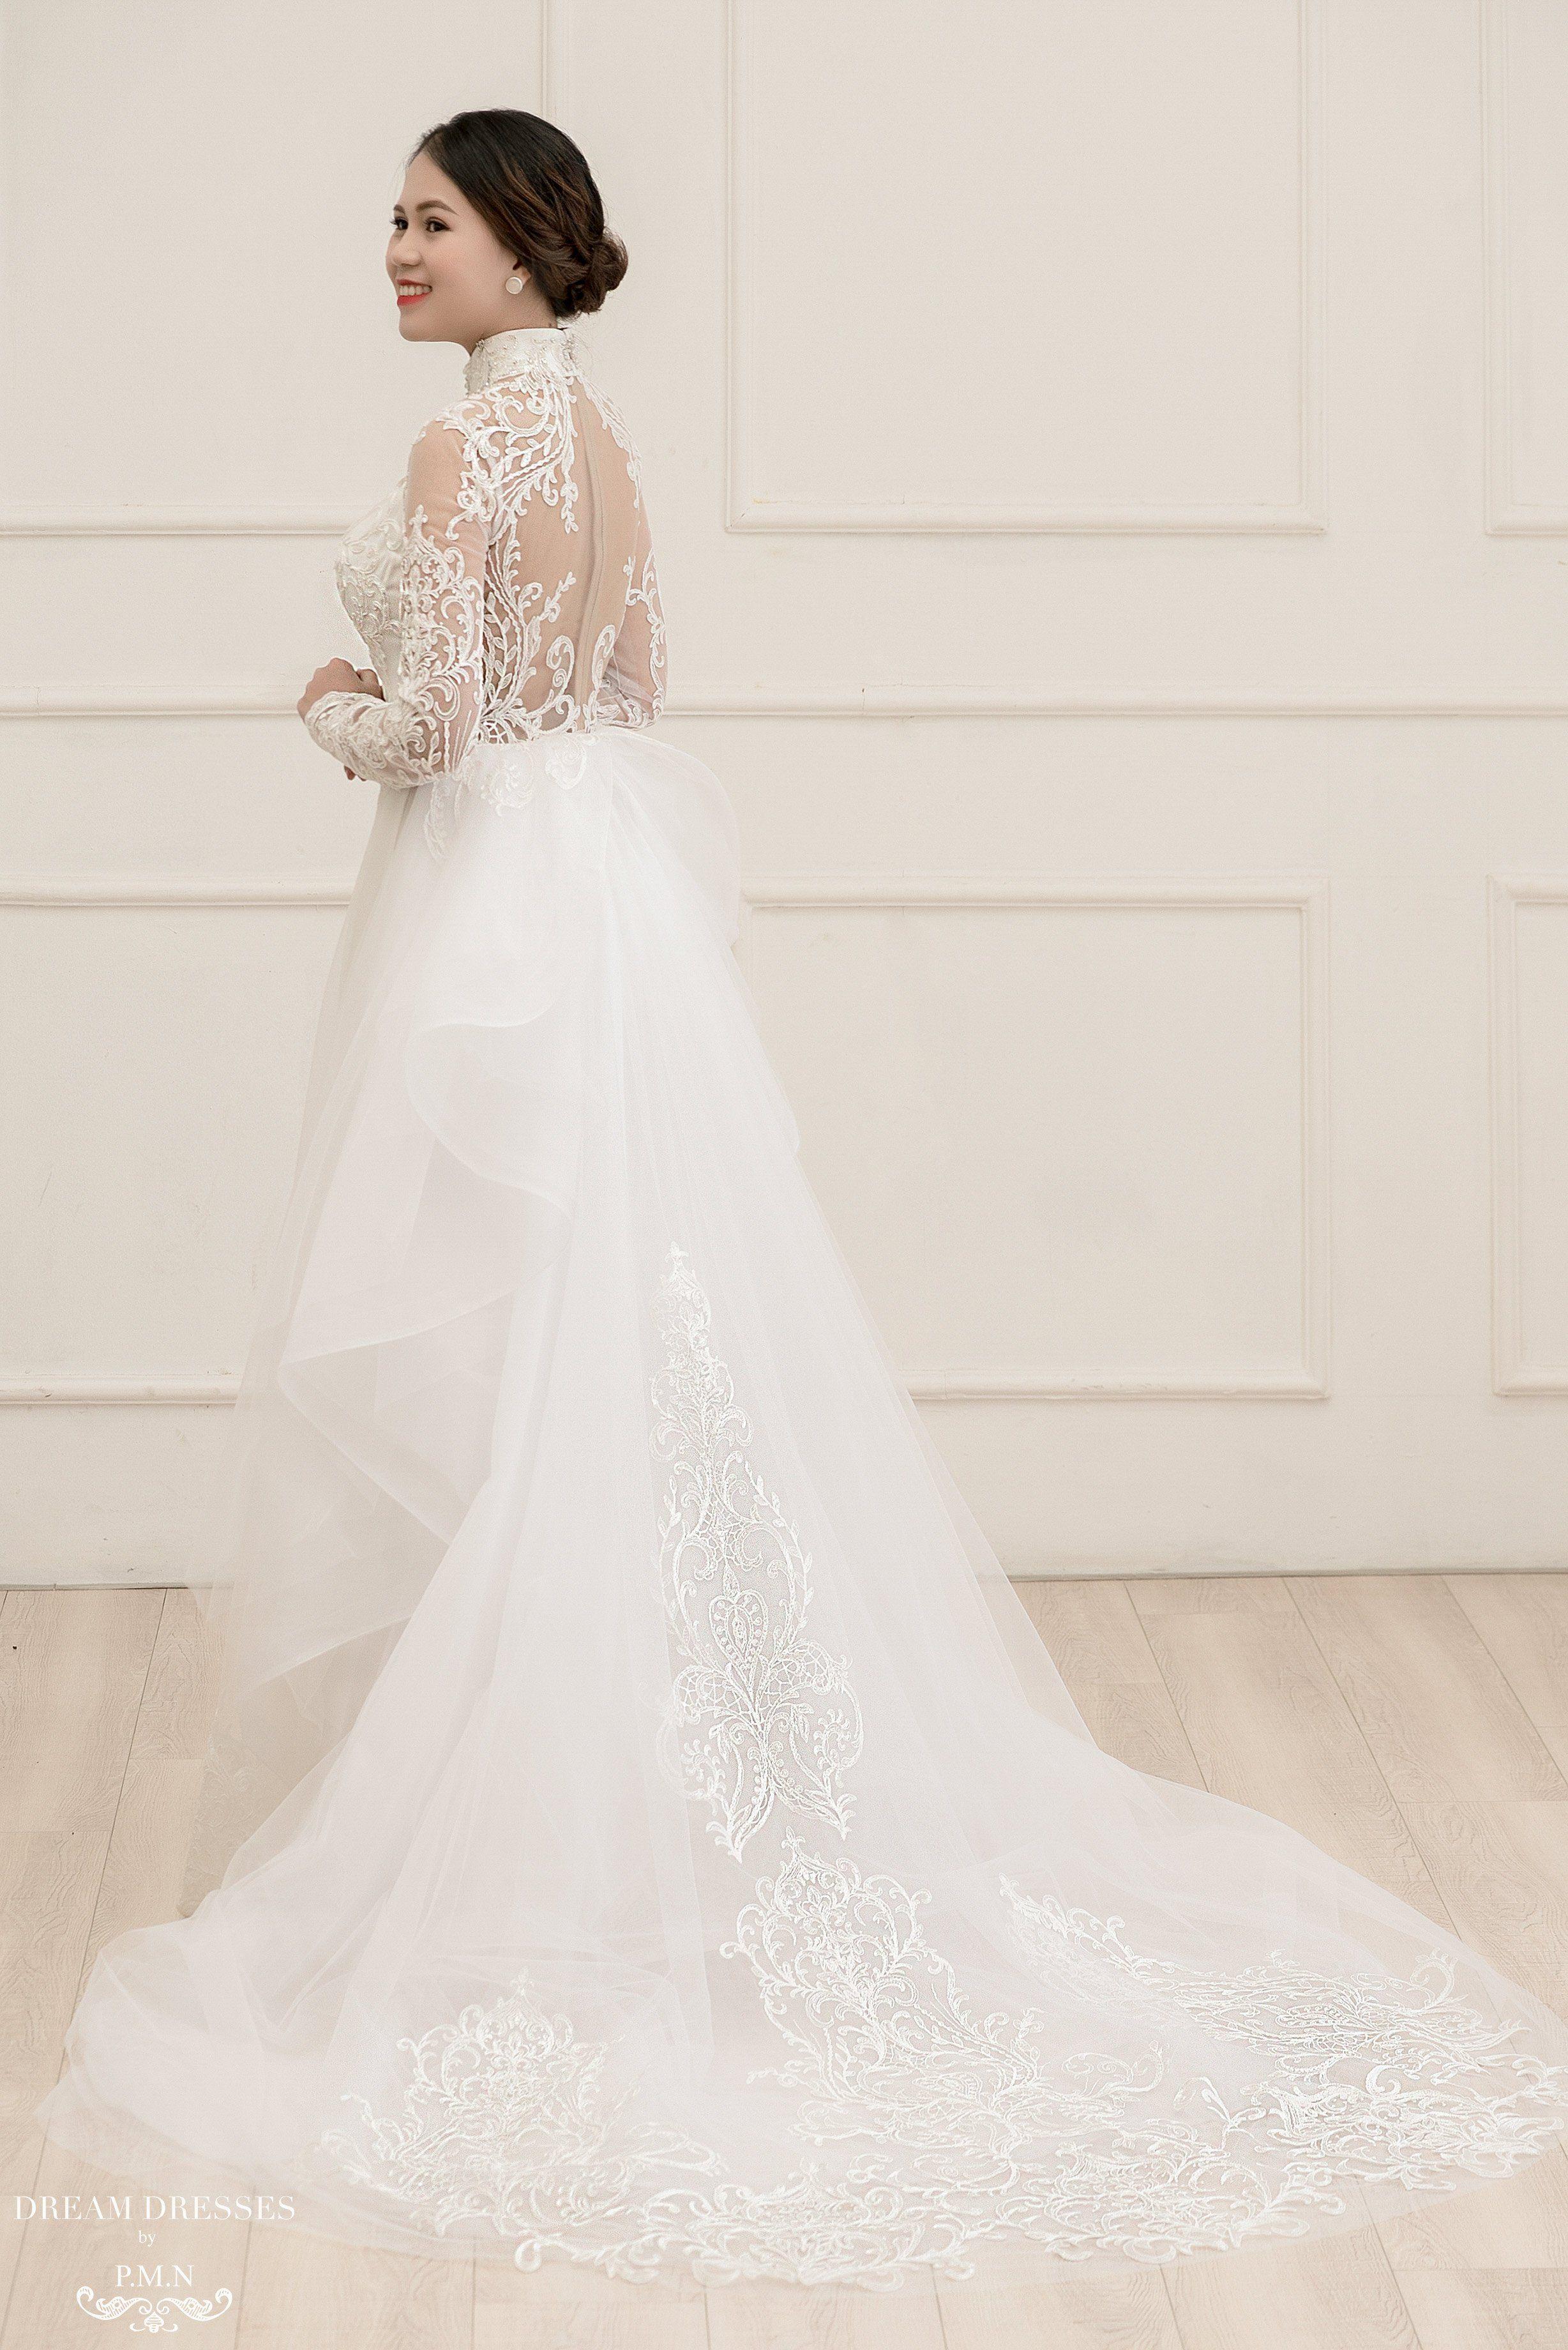 White Ao Dai Modern Vietnamese Lace Bridal Dress (PAIGE